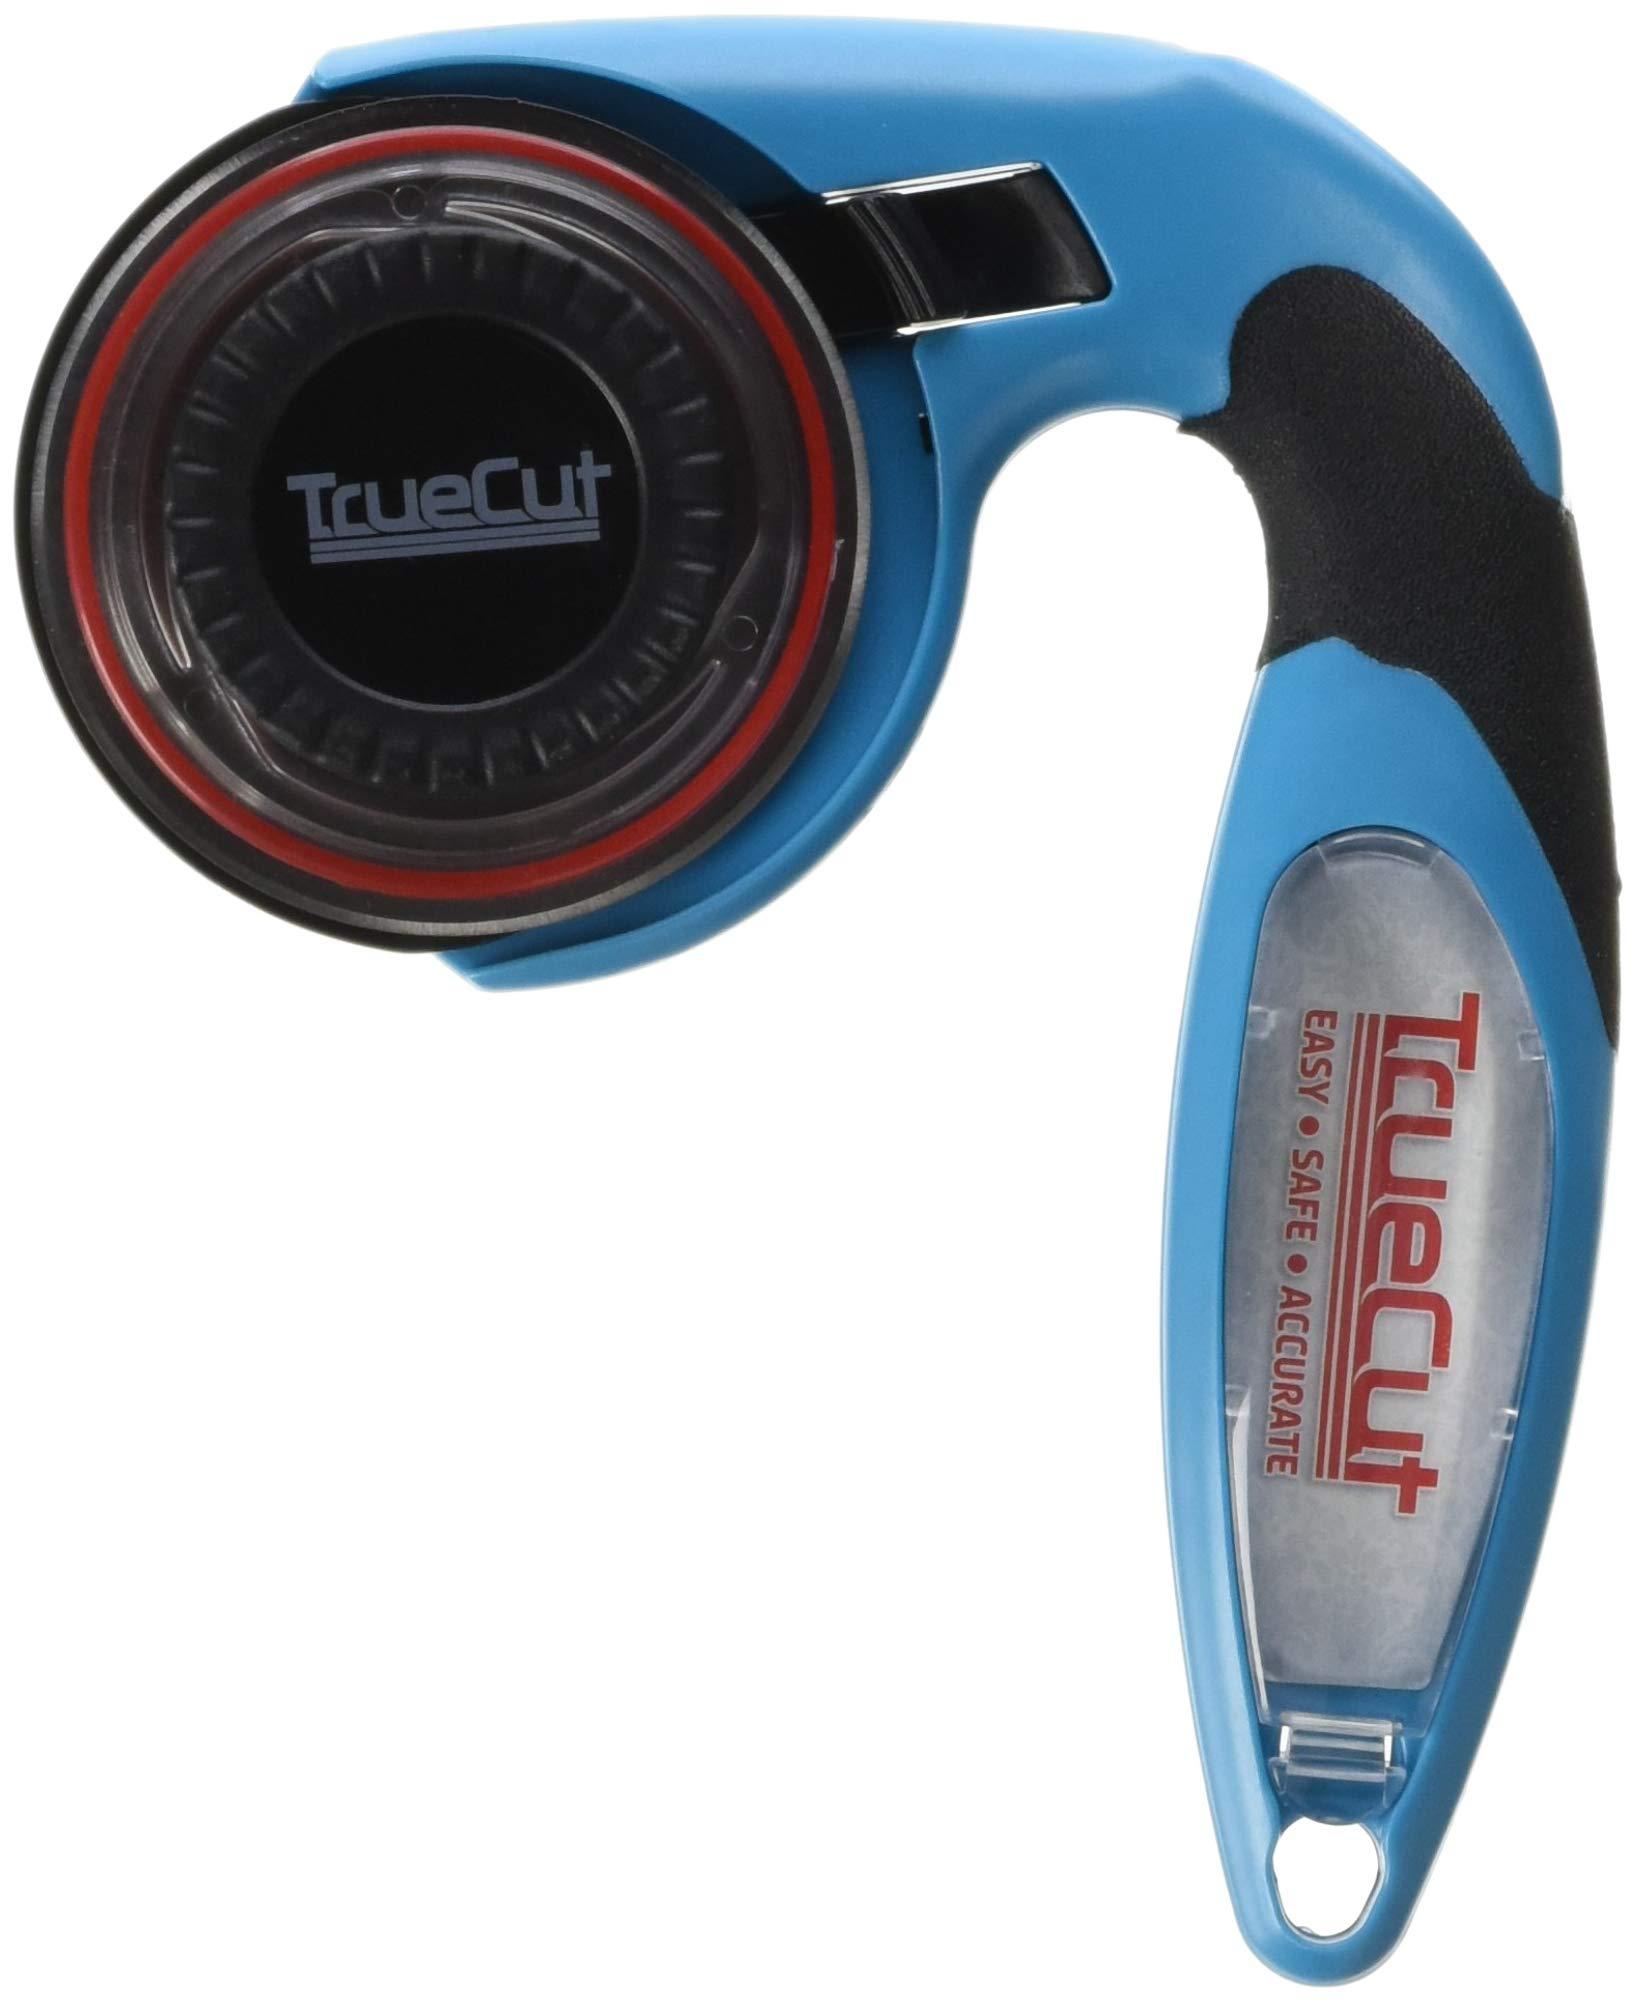 Grace Company TrueCut My Comfort Cutter: 60mm by Grace Company